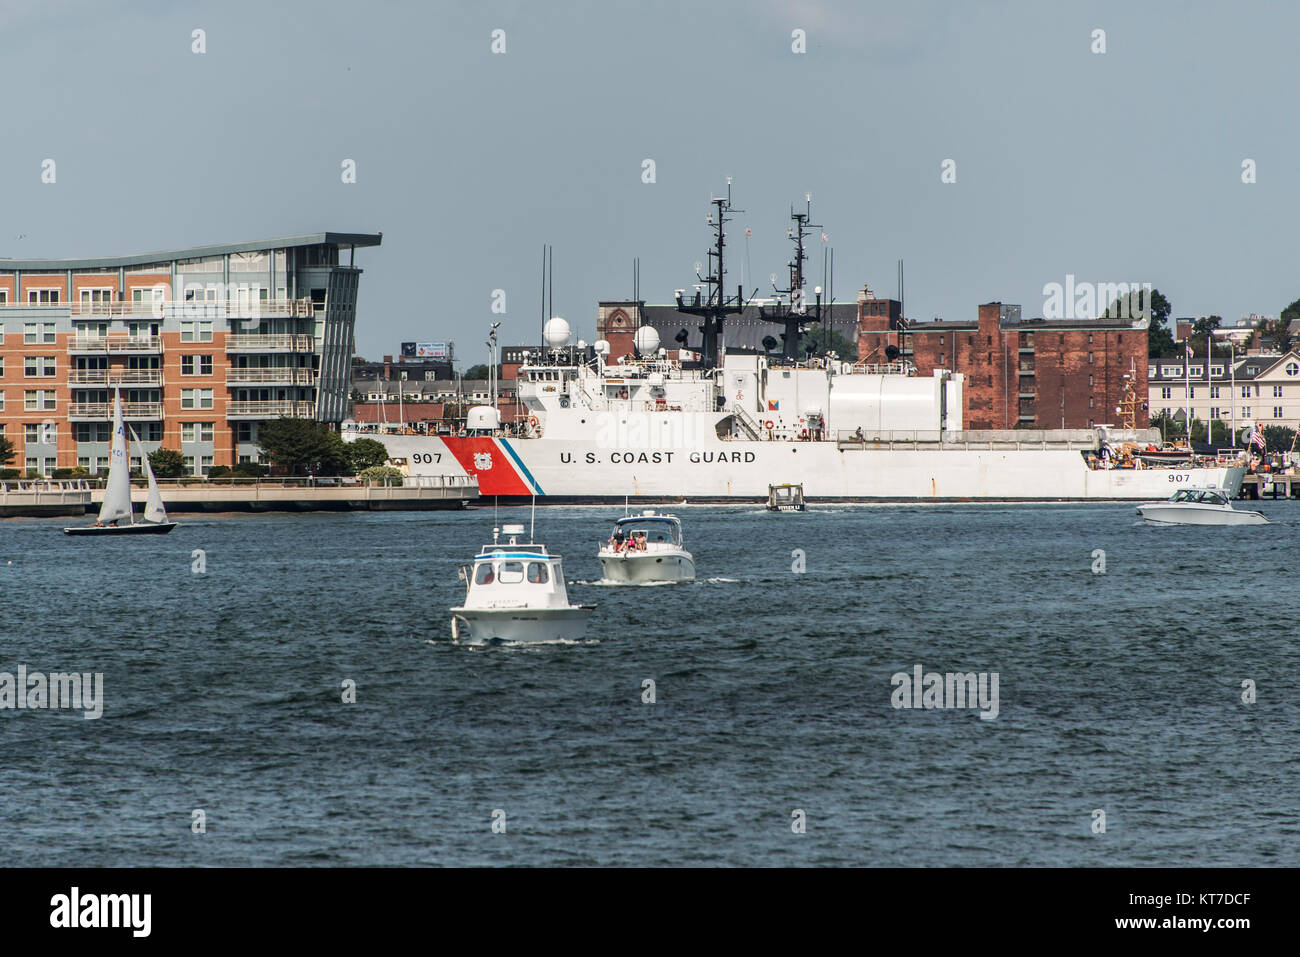 Boston, MA, USA 05.09.2017 Ships of The US Coast Guard docked at Base Boston on sunny day - Stock Image